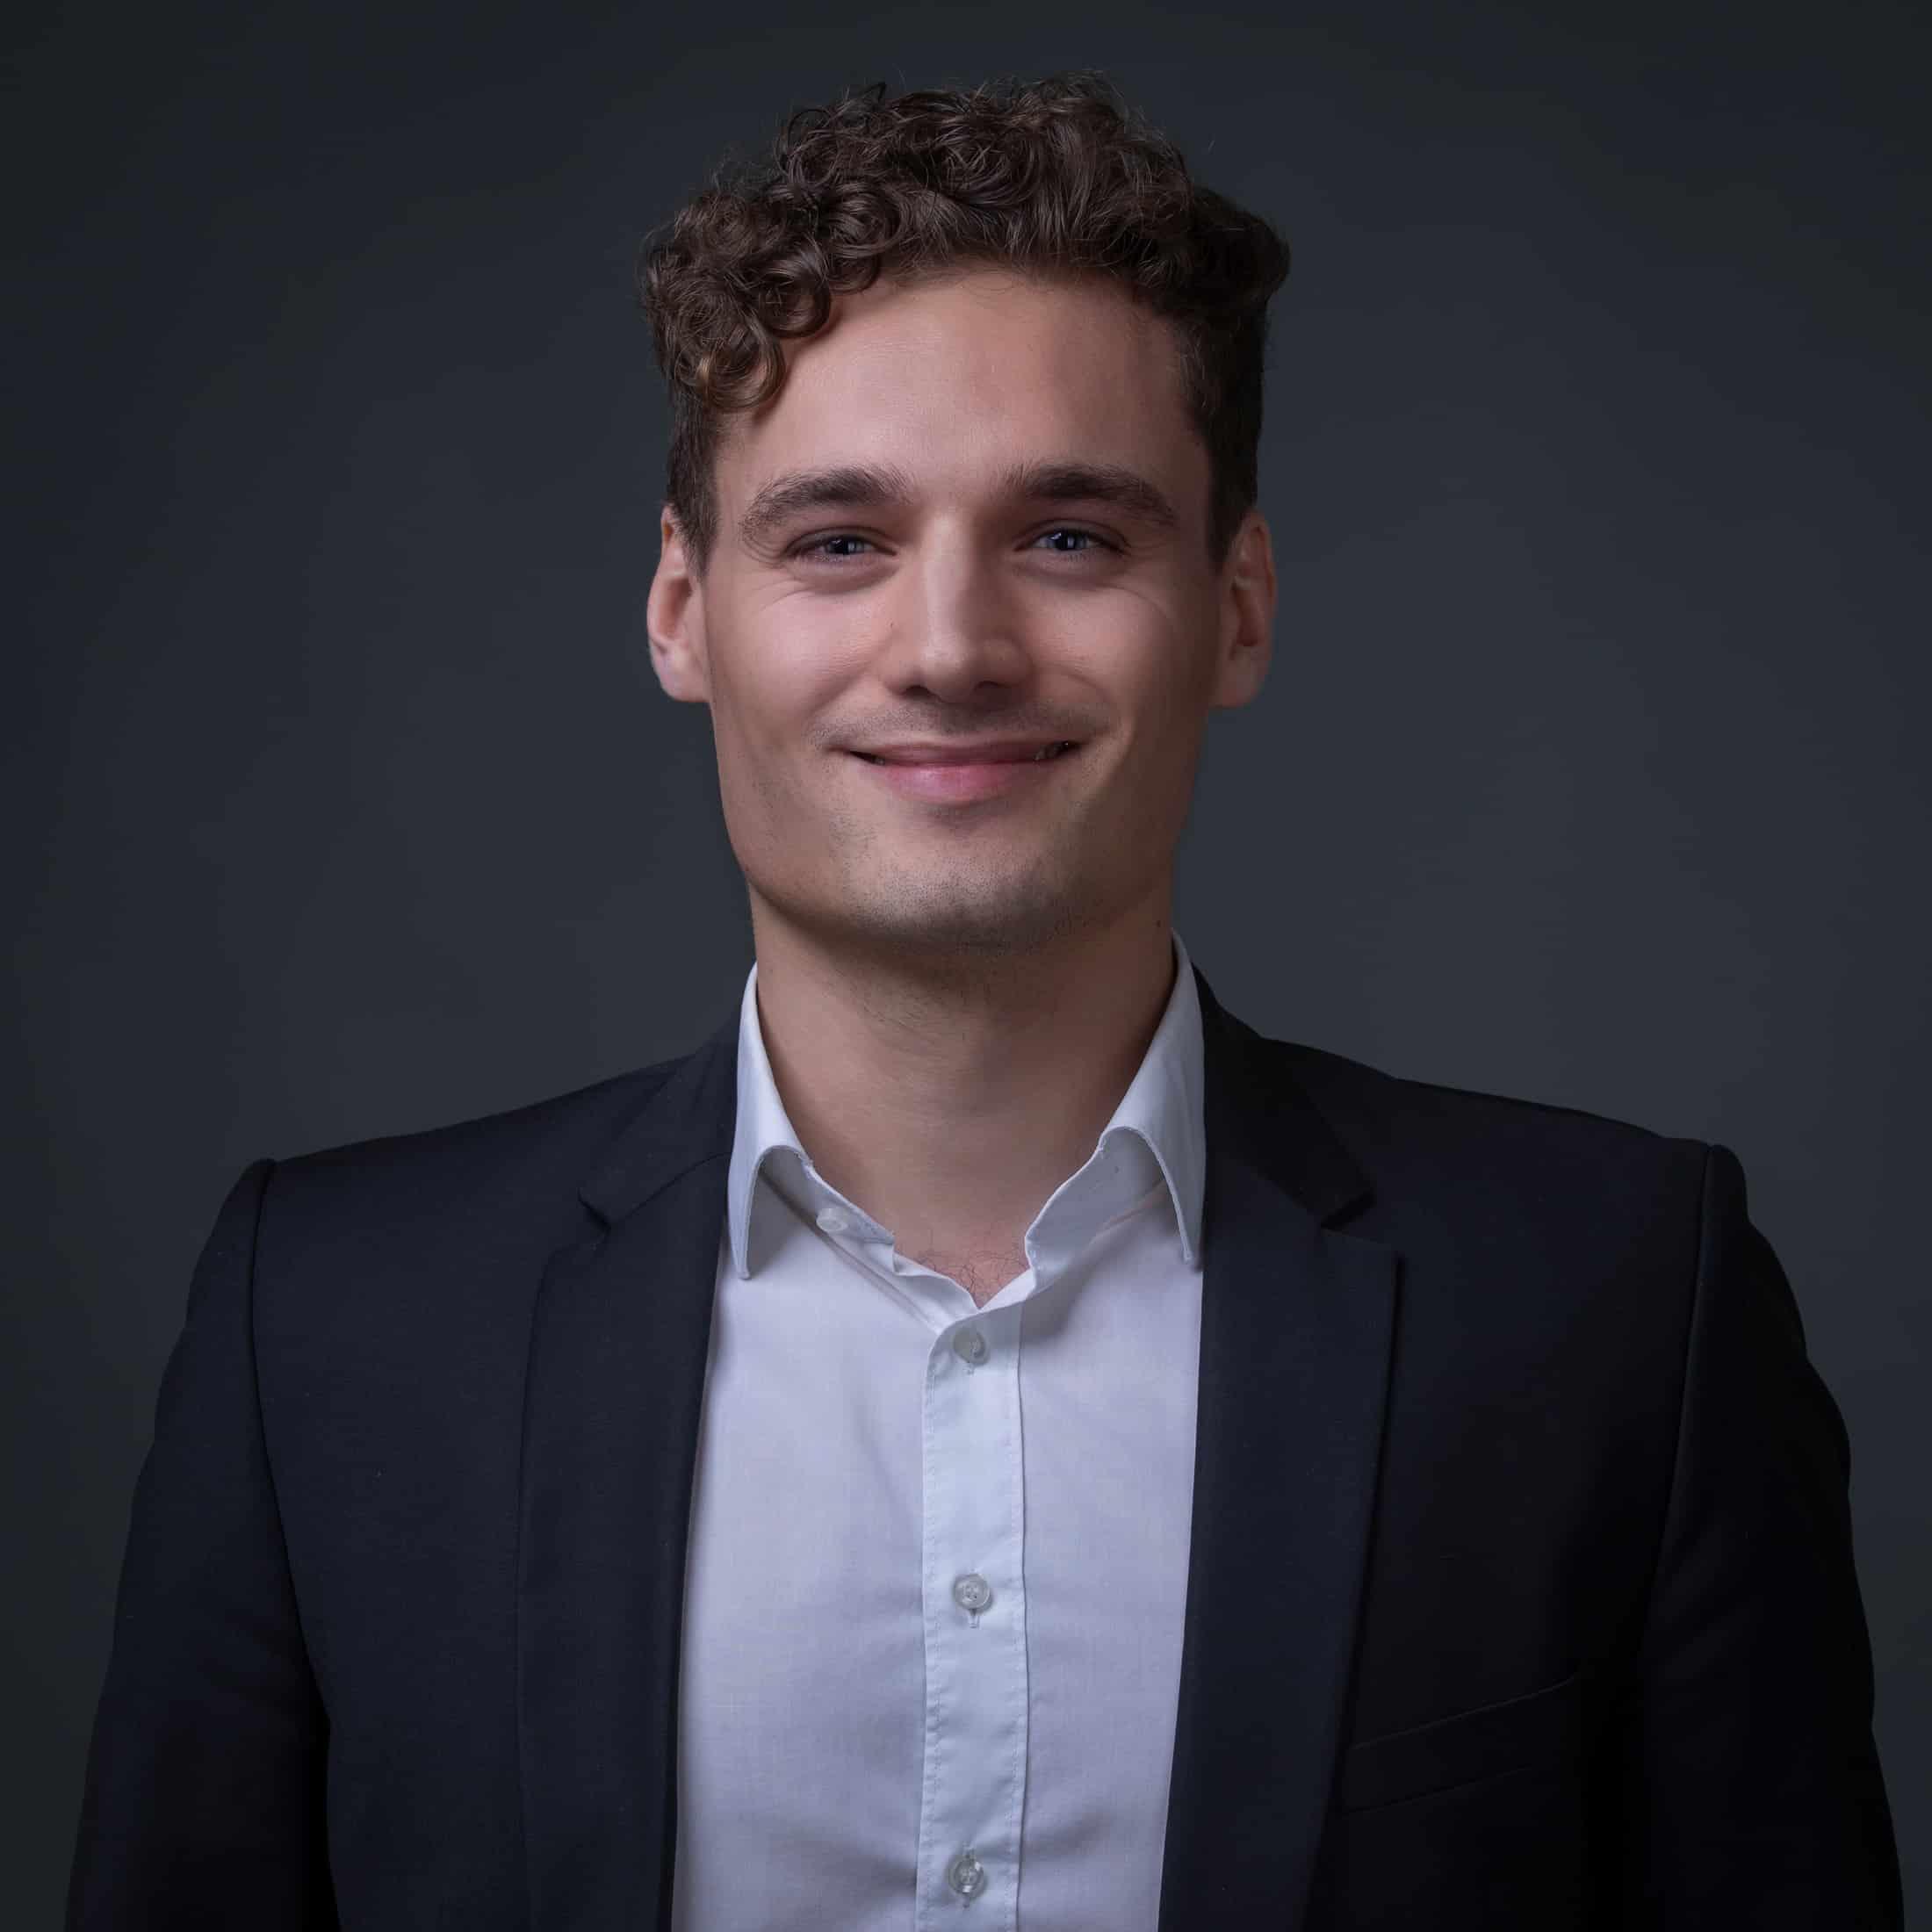 Niklas Springer